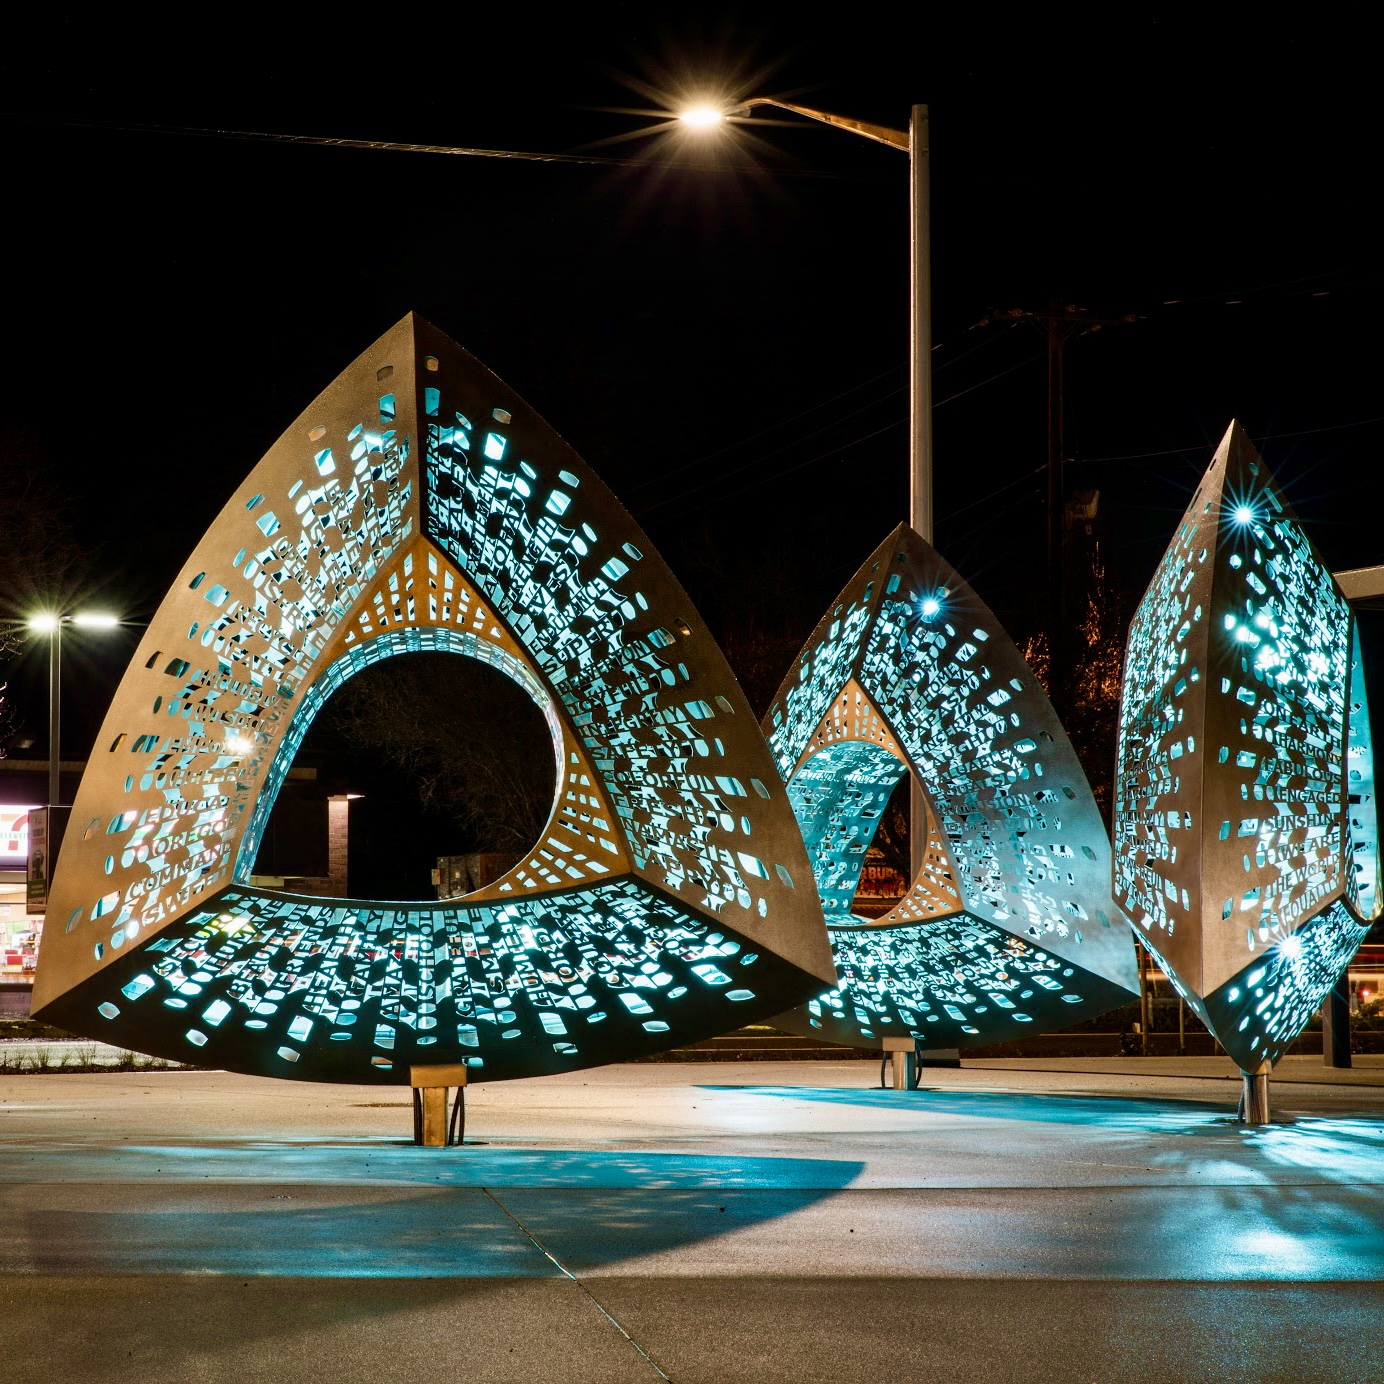 Insignias: Beaverton Public Safety Center